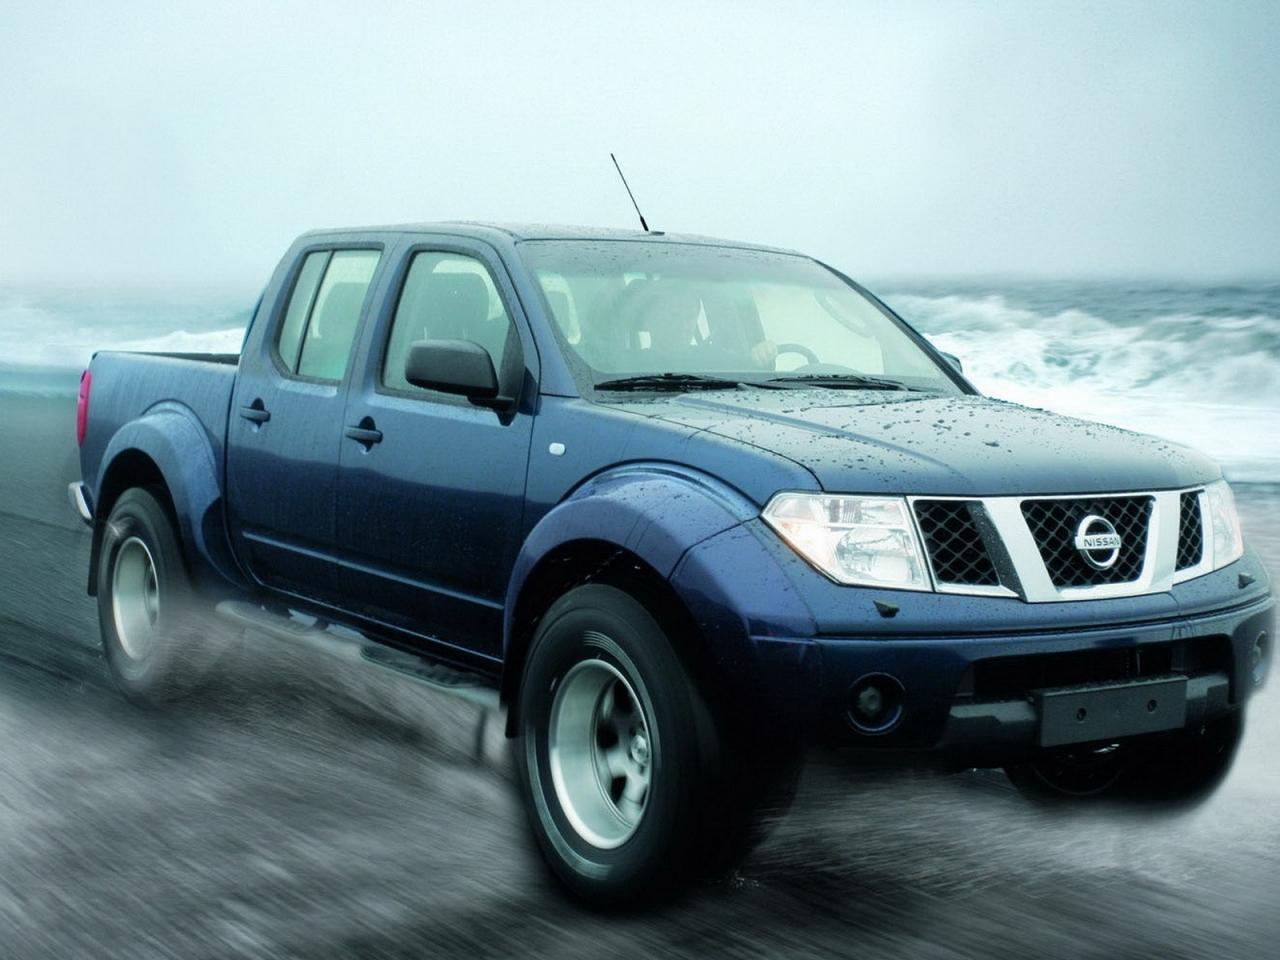 Pickup Nissan azul - 1280x960